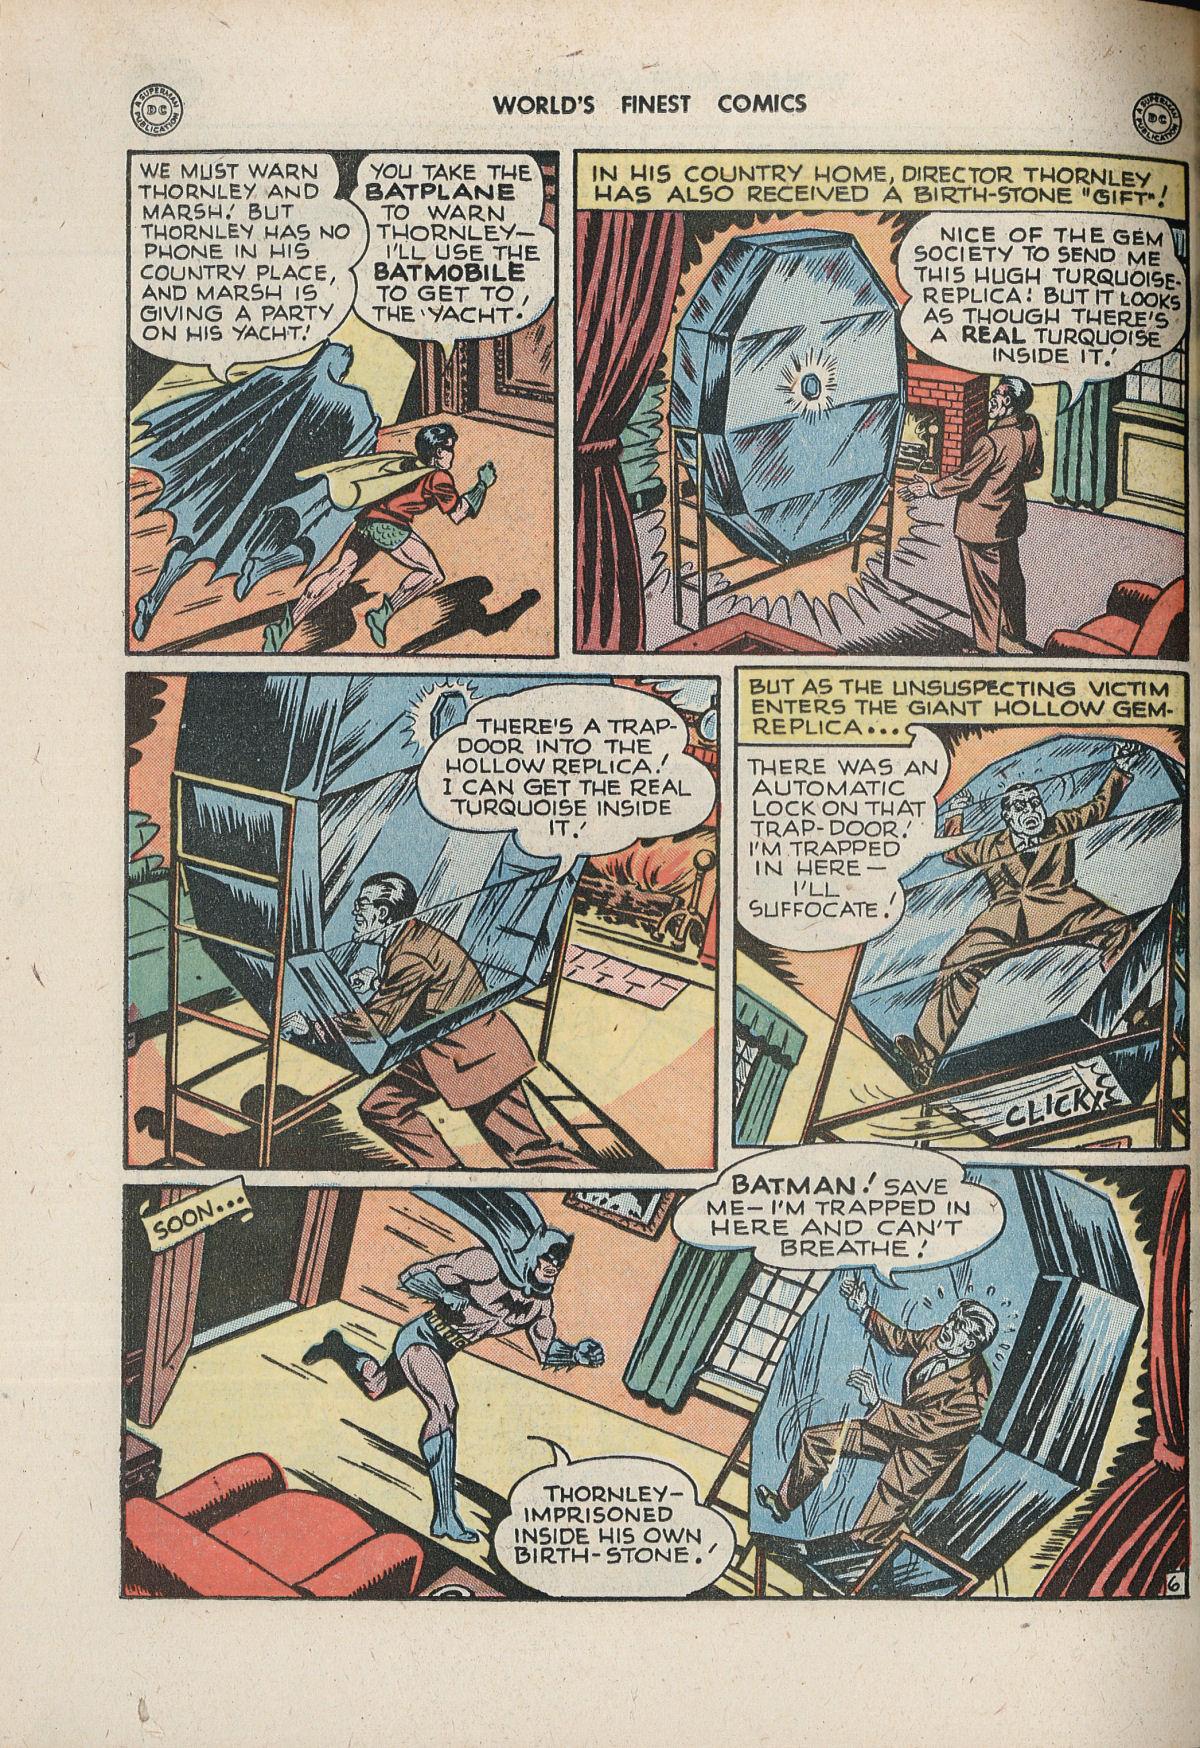 Read online World's Finest Comics comic -  Issue #33 - 66